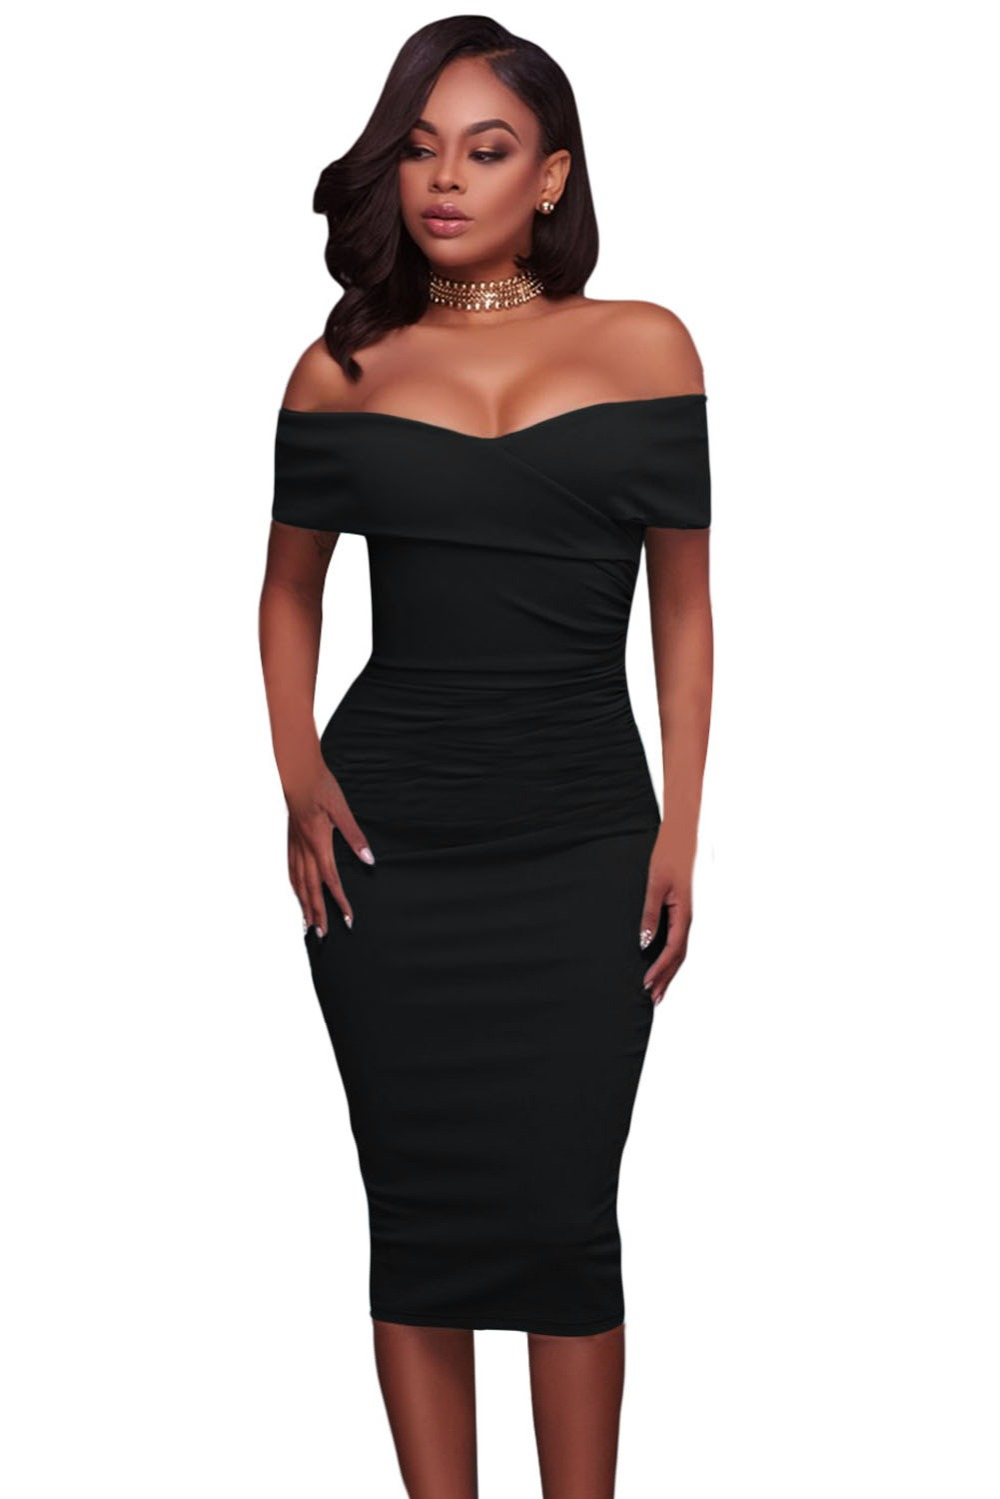 Black-Ruched-Off-Shoulder-Bodycon-Midi-Dress-LC61507-2-1